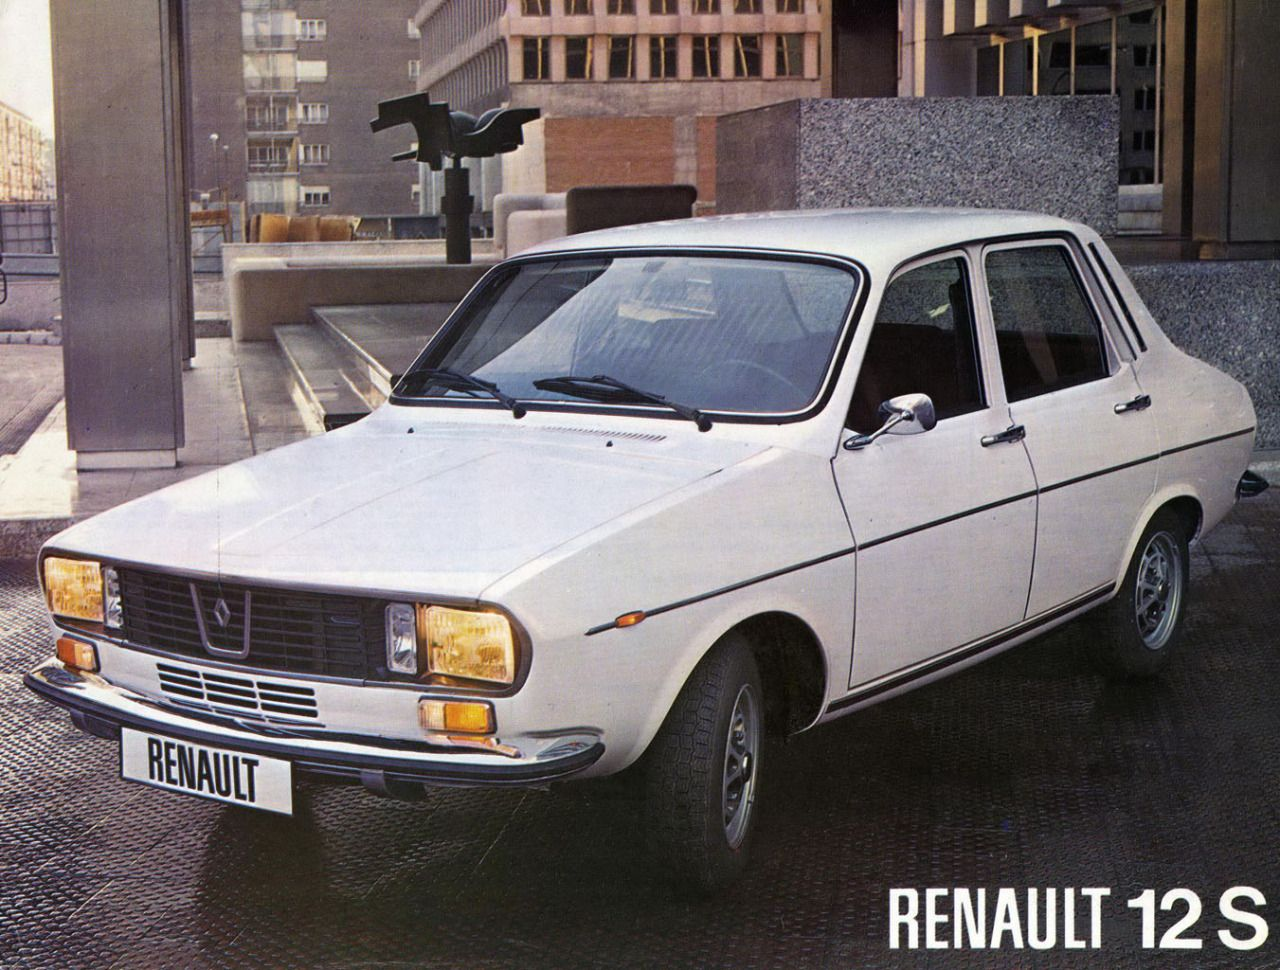 1975 Renault 12 spanish sales brochure